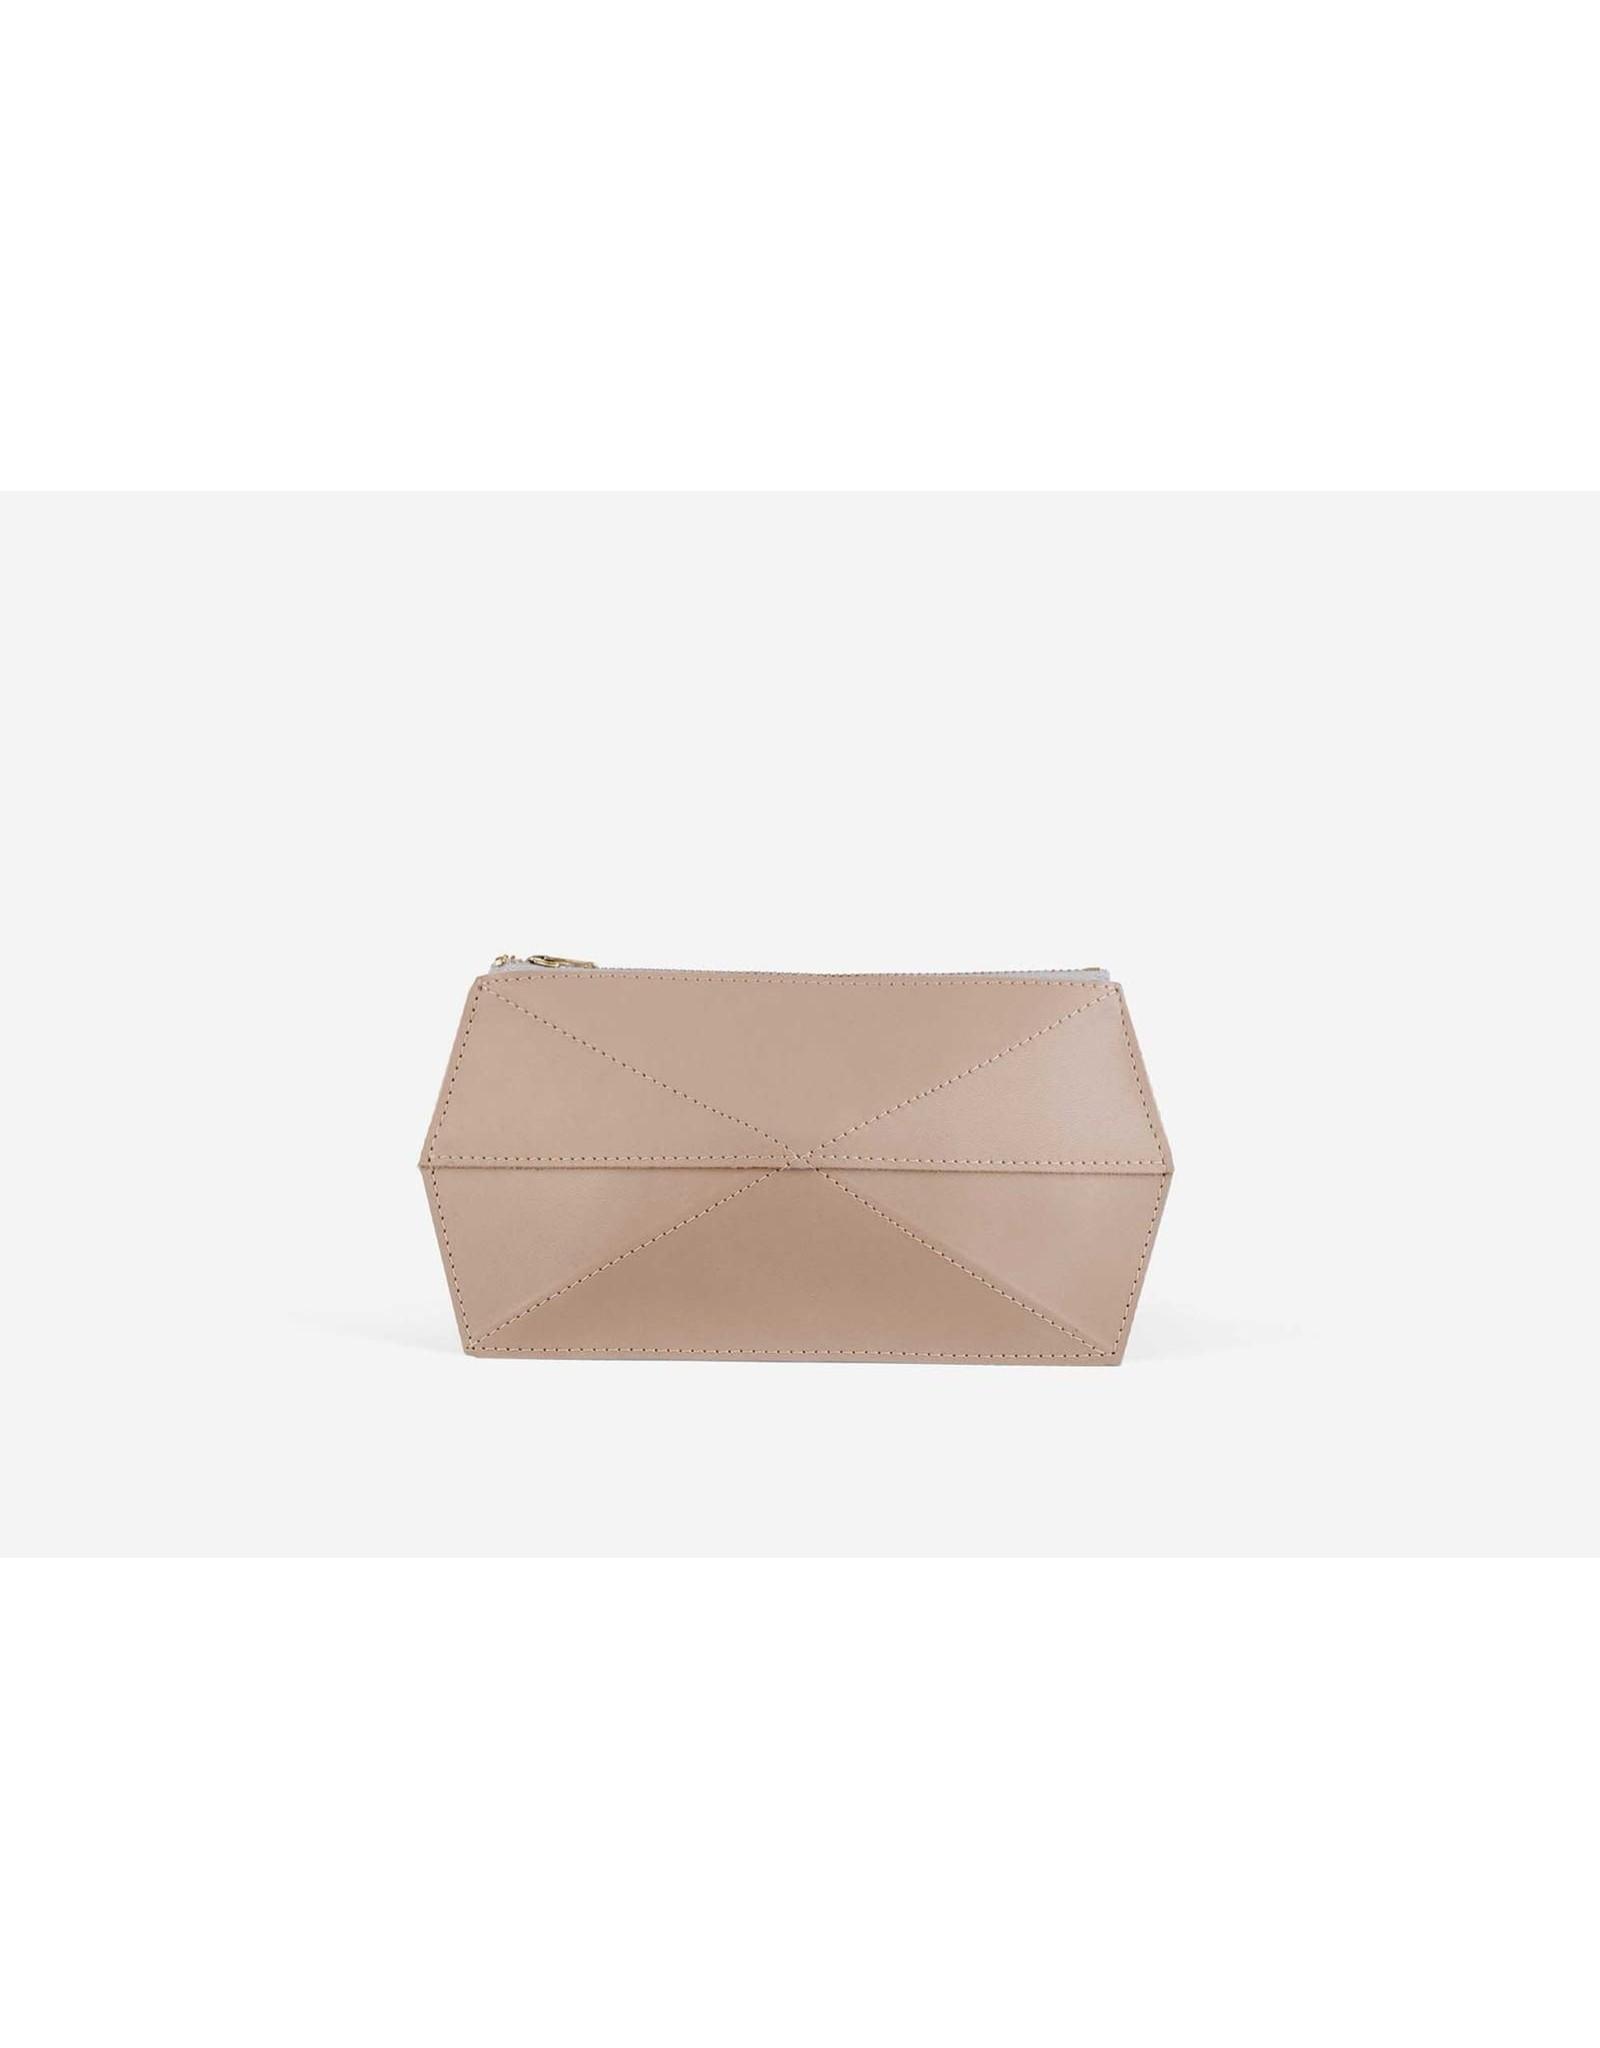 Zand-erover portemonee 3D case   Mini Fold   Nude